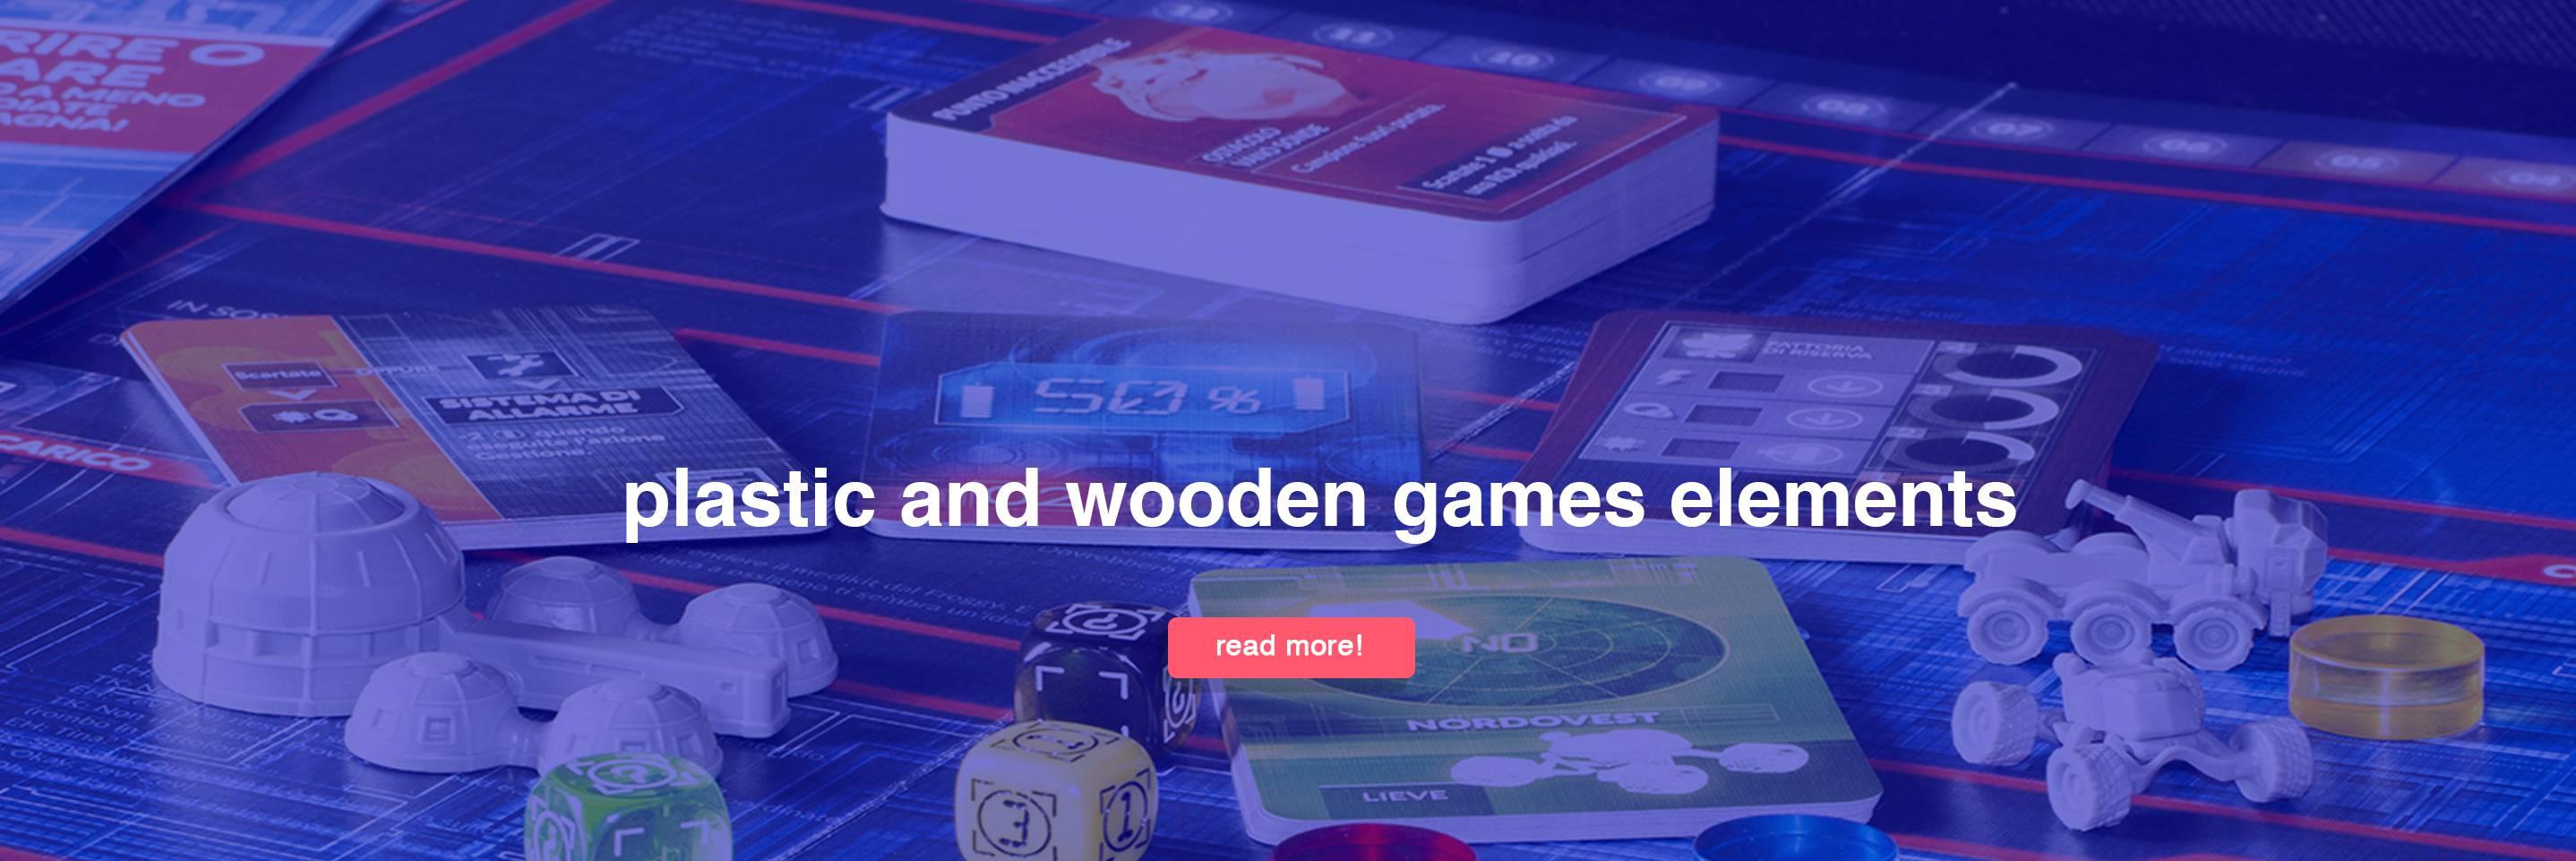 games elements